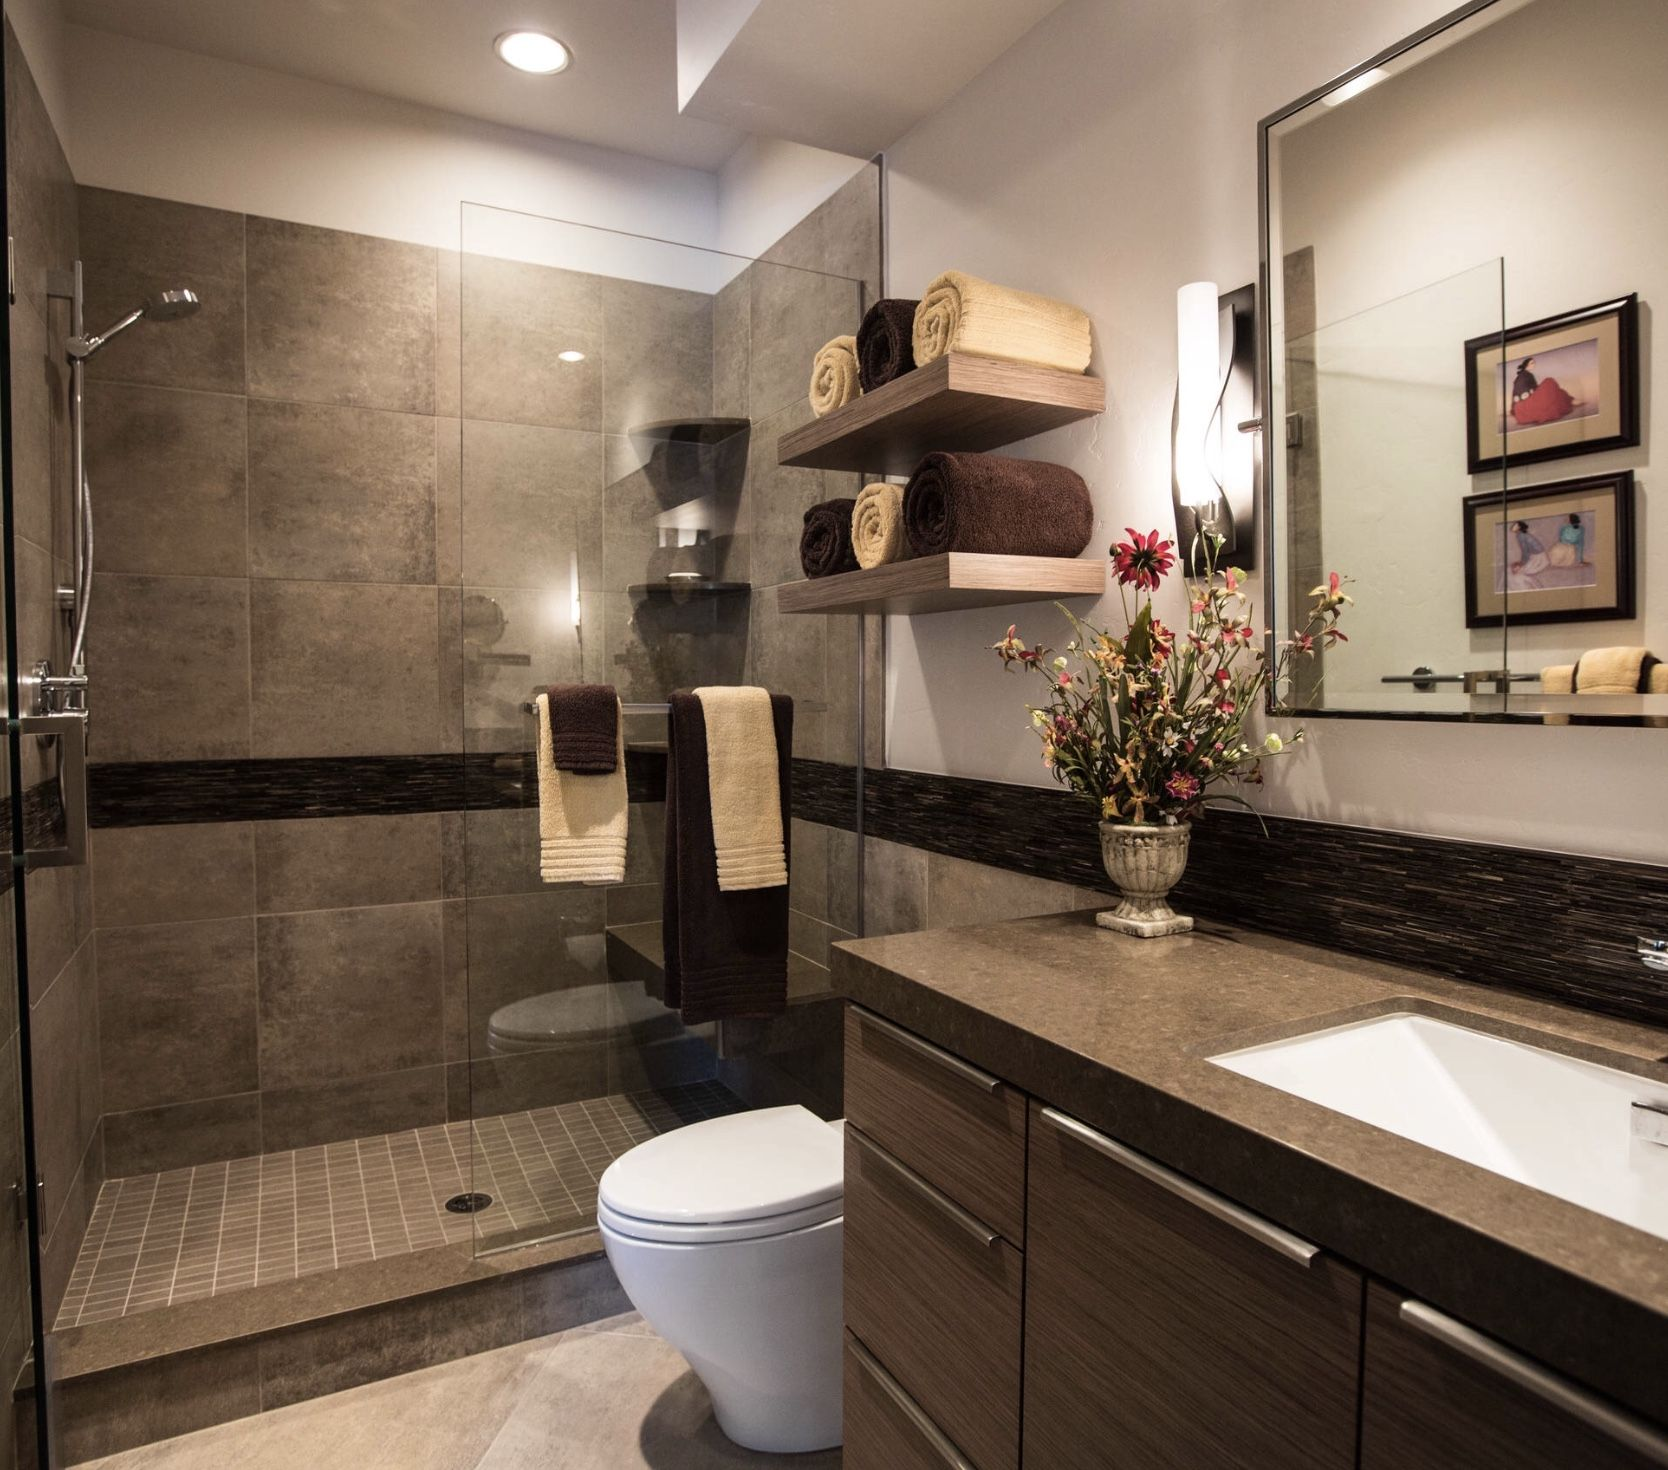 bathroom colors brown imagepremier blueprints on